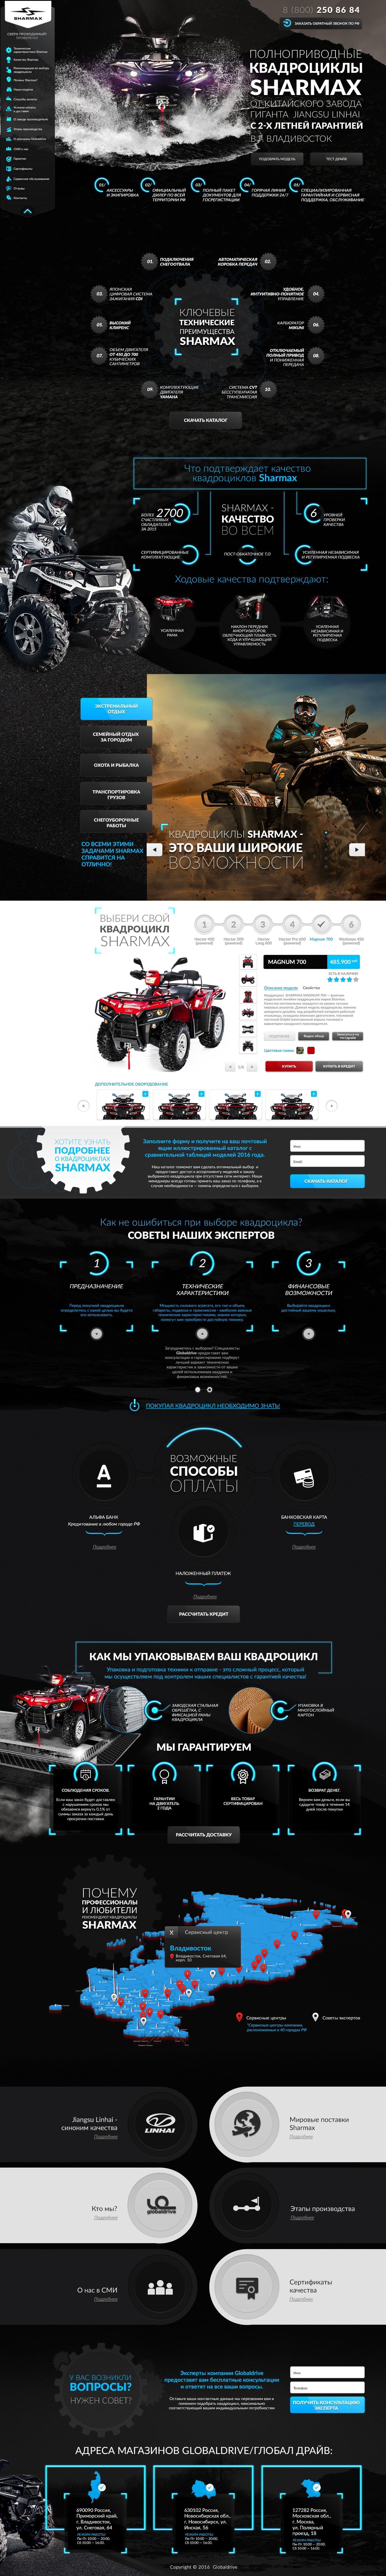 moto website design